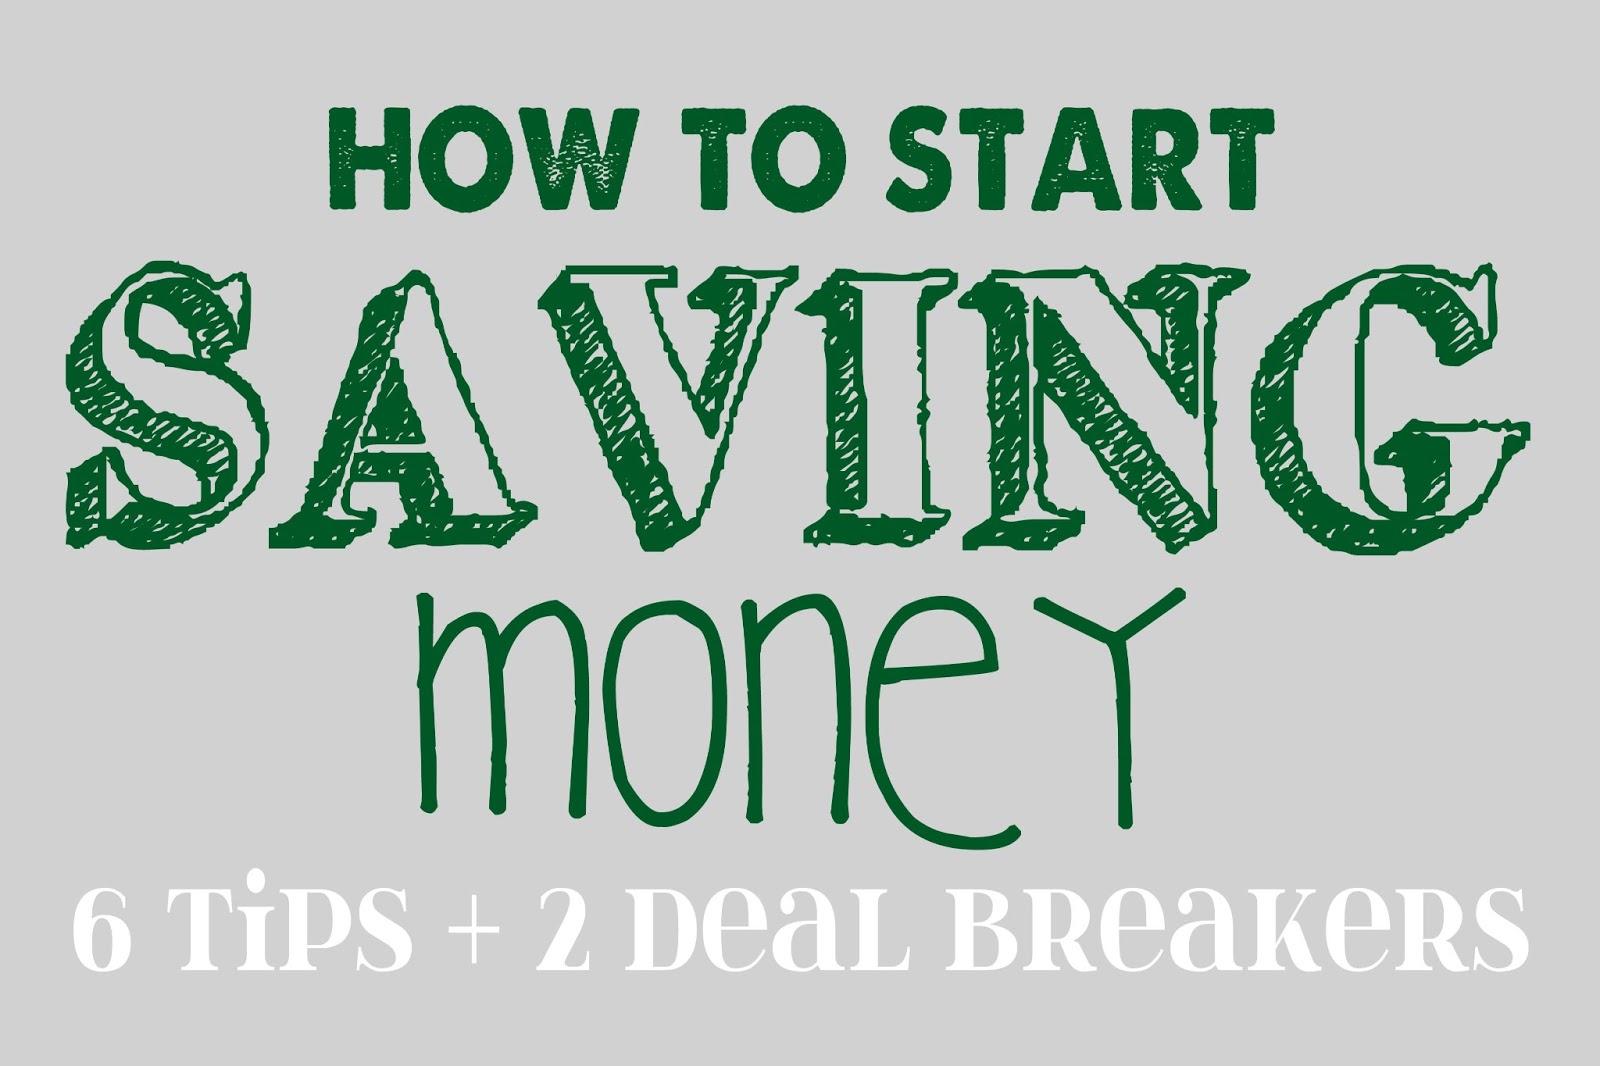 How to Start Saving Money: 6 Tips + 2 Deal Breakers